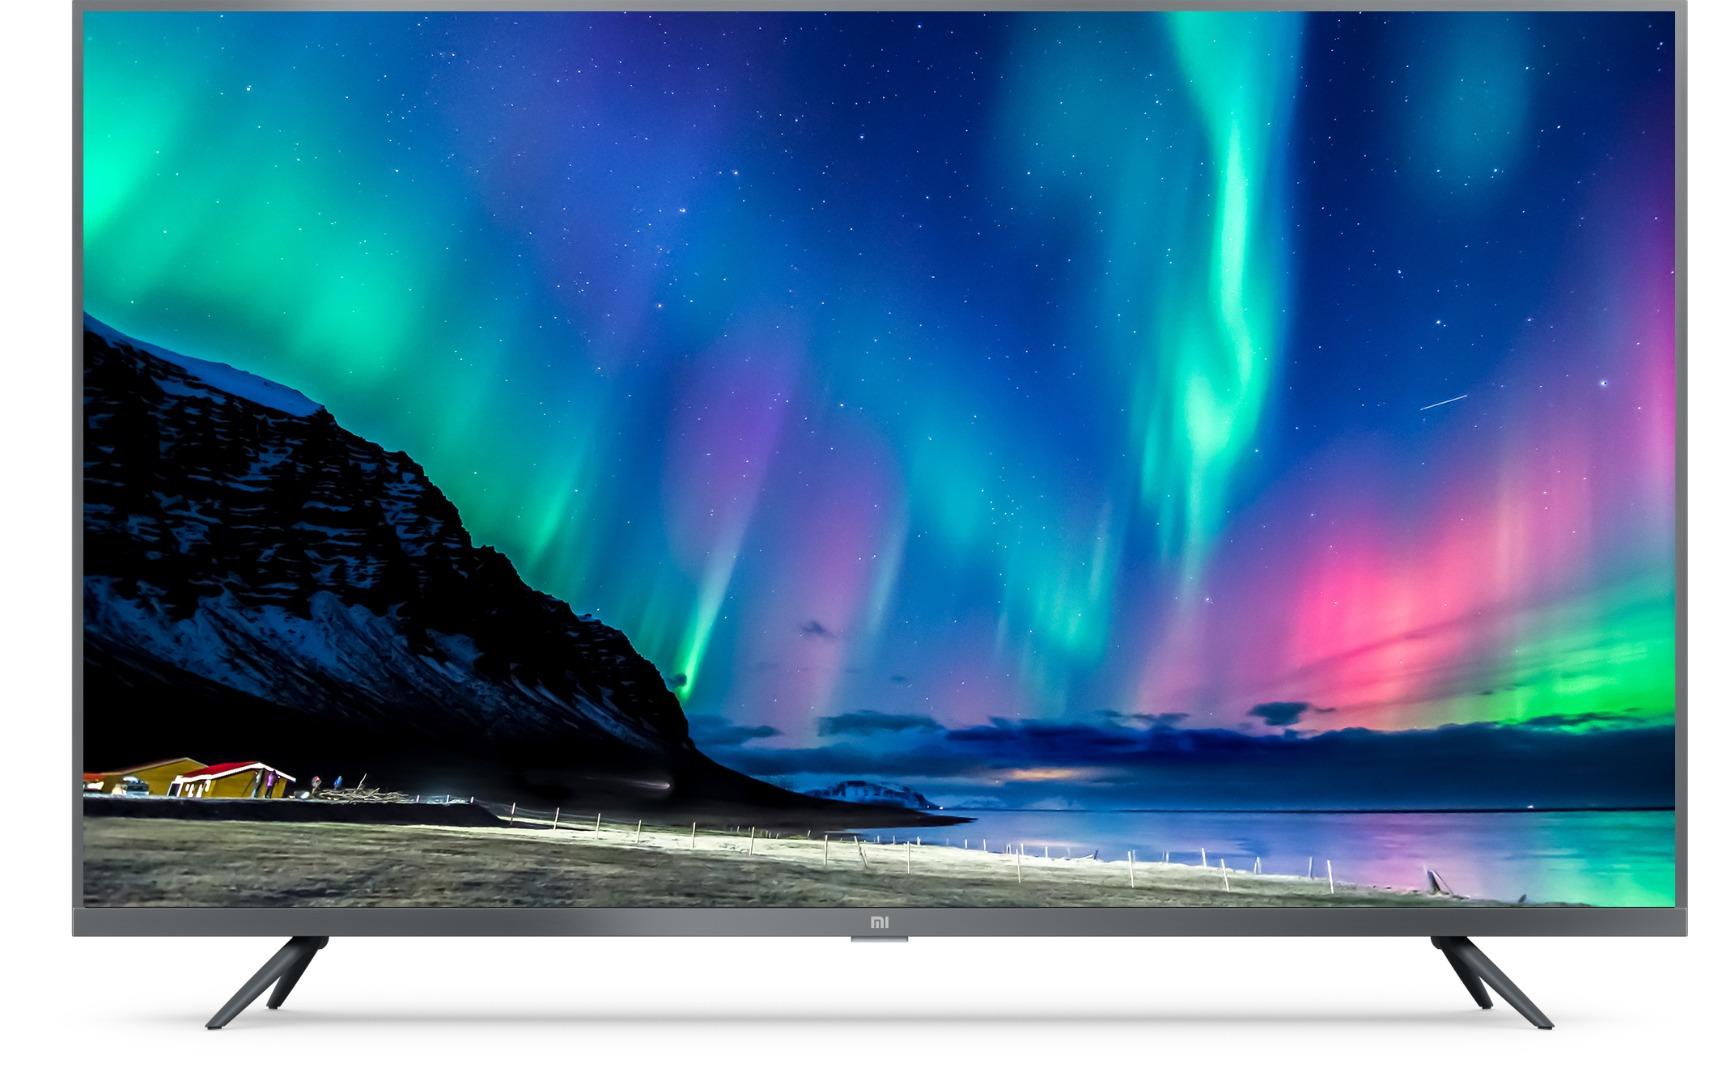 Mi LED TV 4S 4K Ultra HD Smart TV